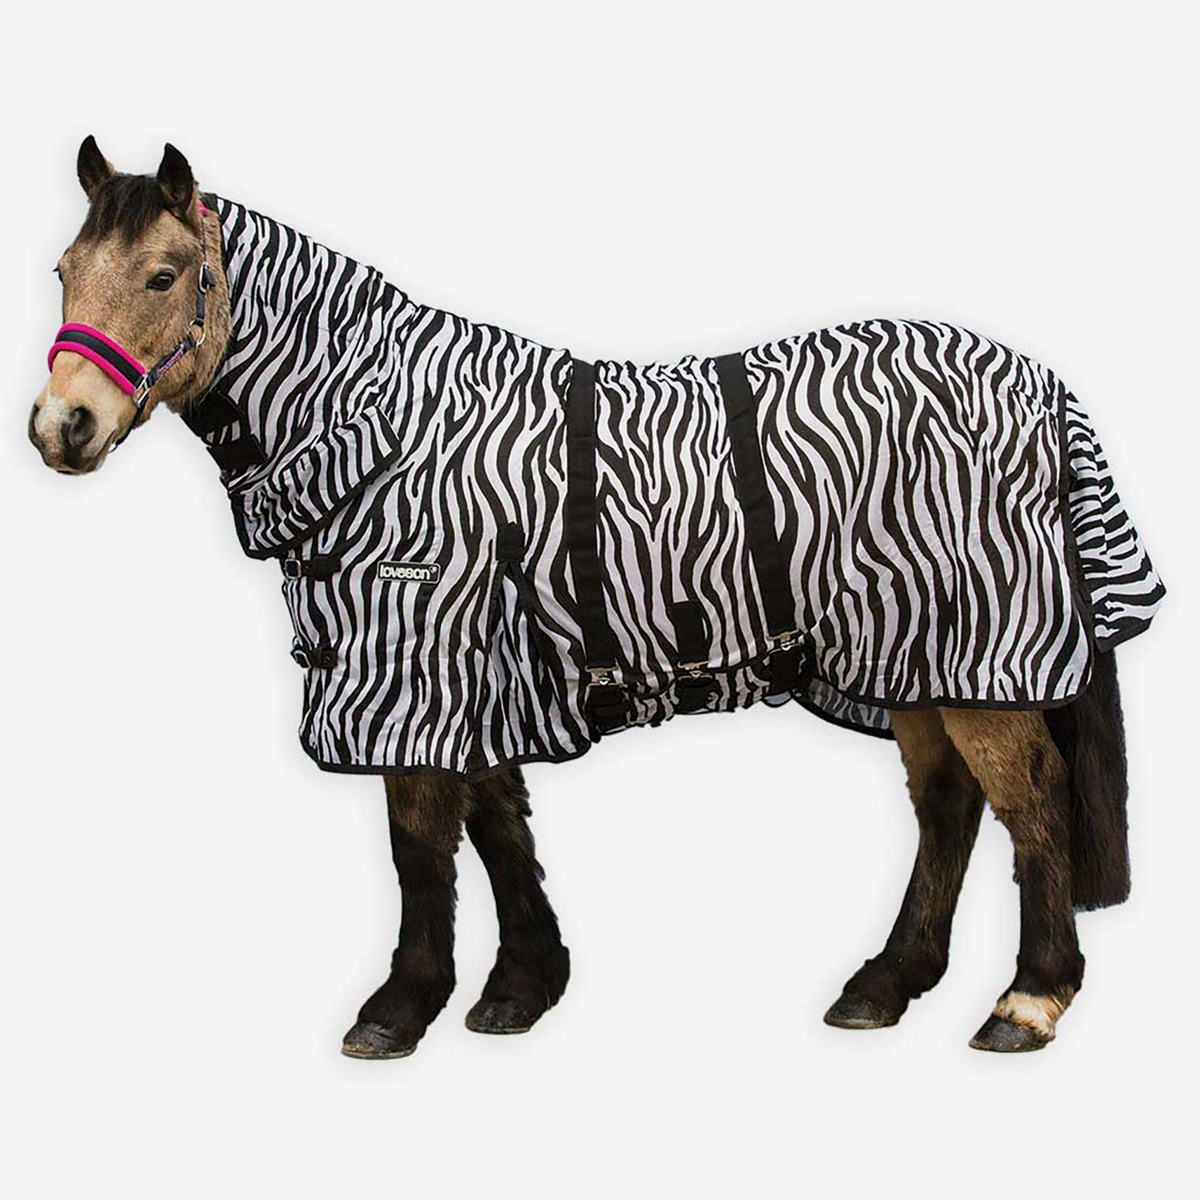 Zebra Fly Rug Uk: Loveson Zebra Fly Rug